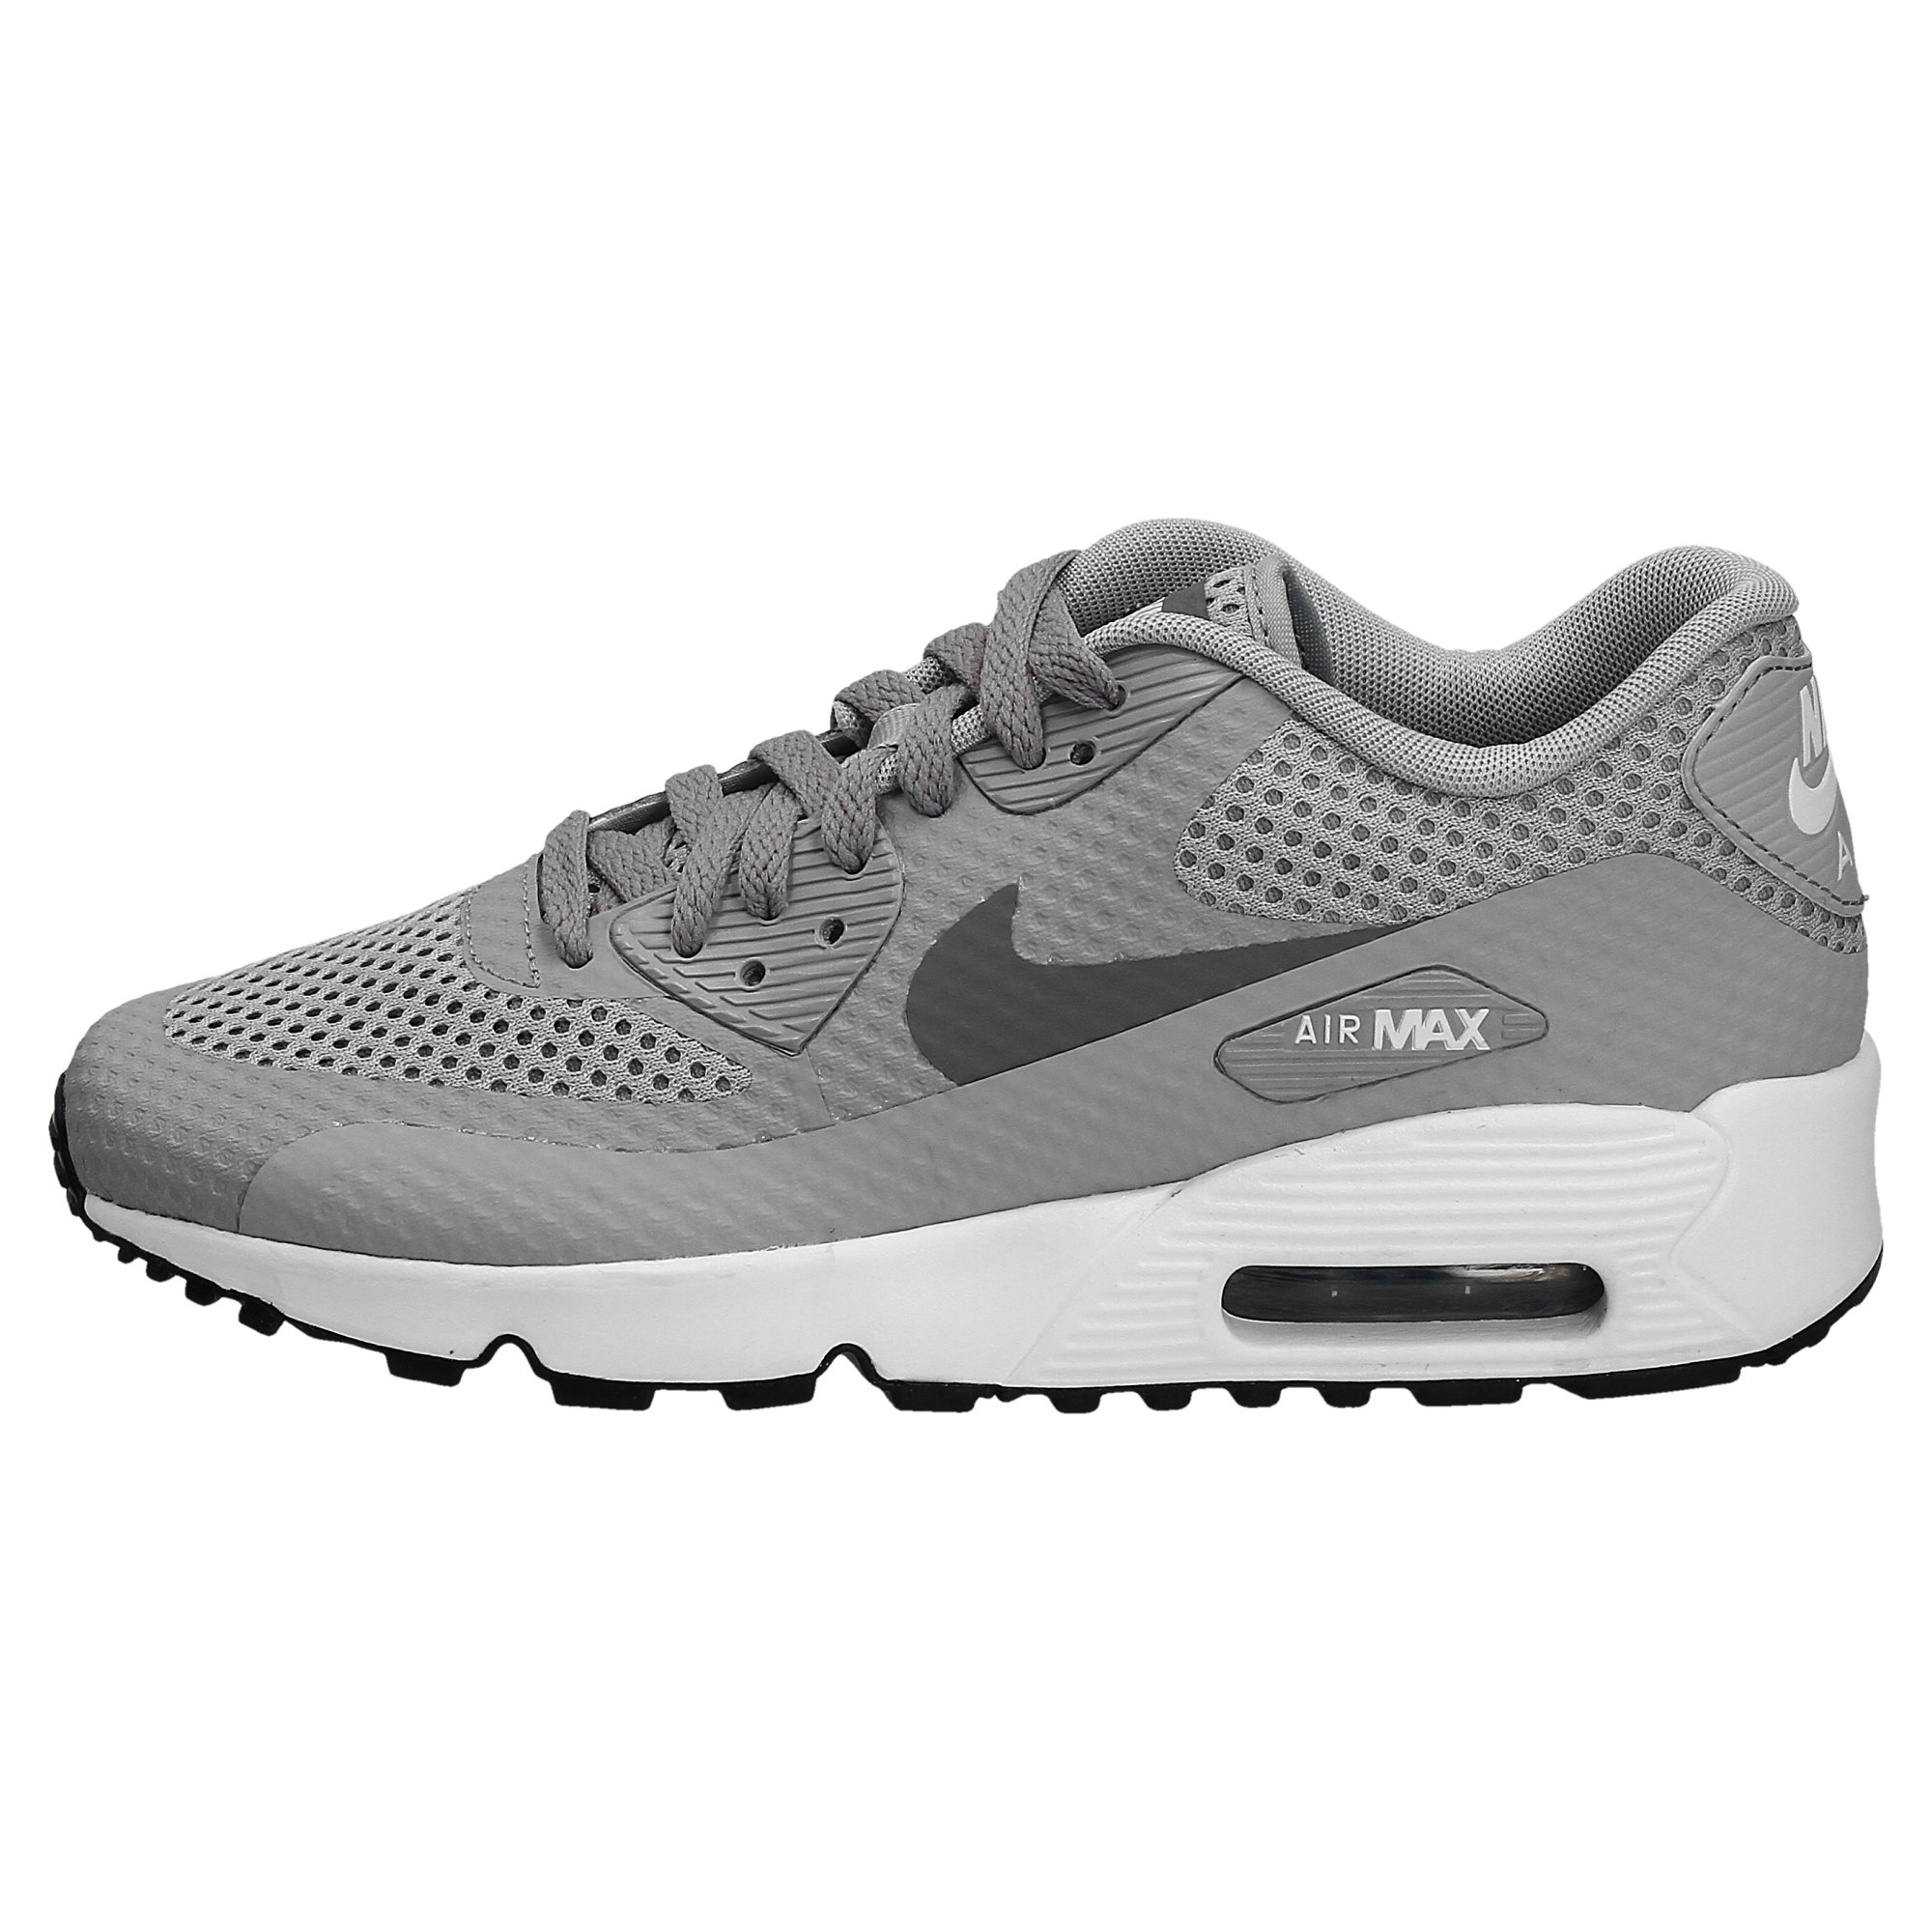 9bda480c076233 Buty damskie sportowe Nike Air Max 90 r 38,5 - 7572339126 ...